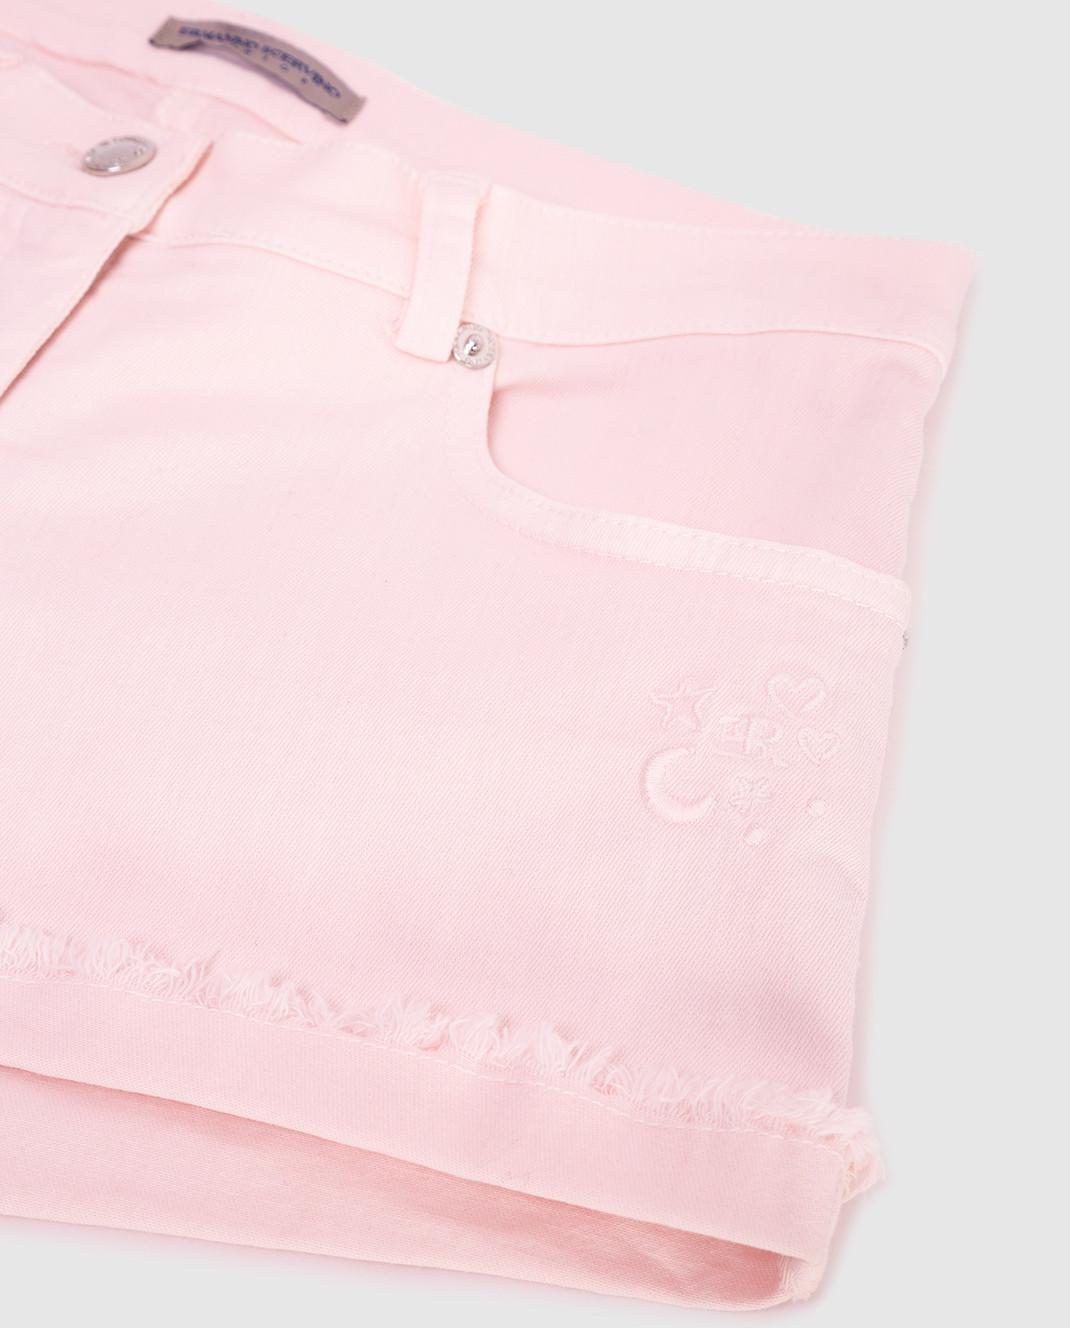 Ermanno Scervino Детские розовые шорты PC061014 изображение 3